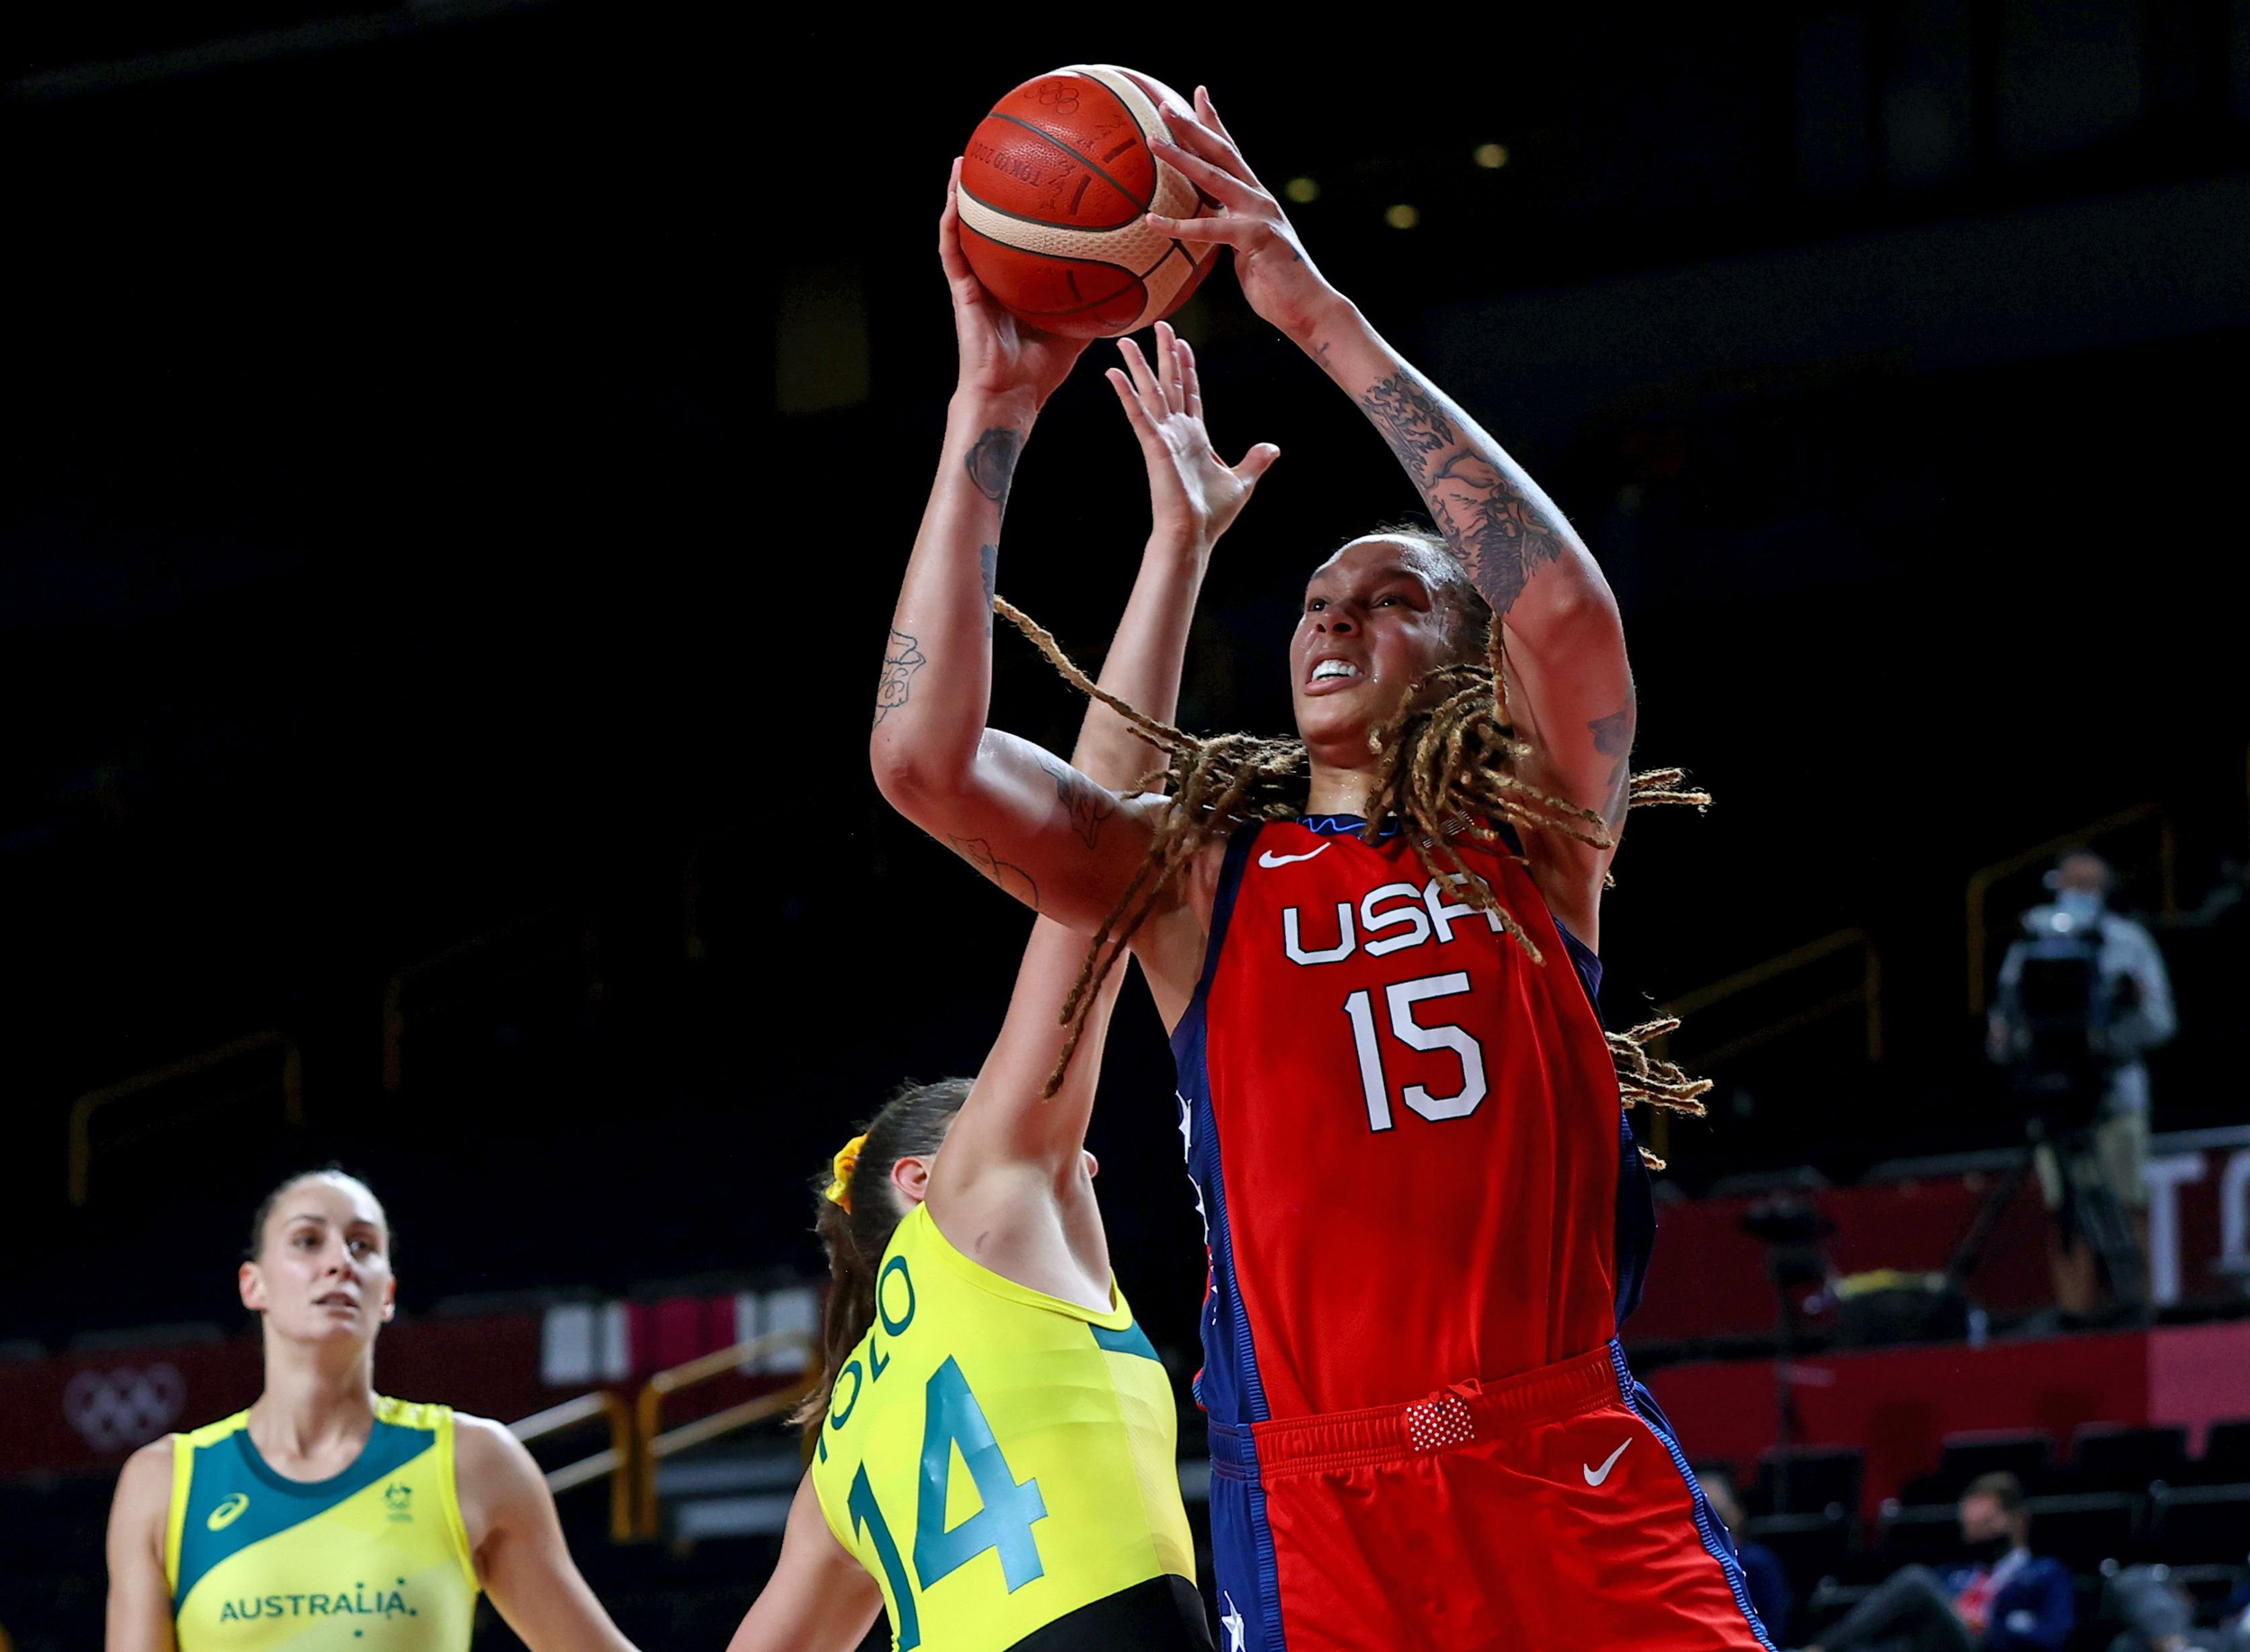 U.S. women's basketball routs Australia, advances to semifinals